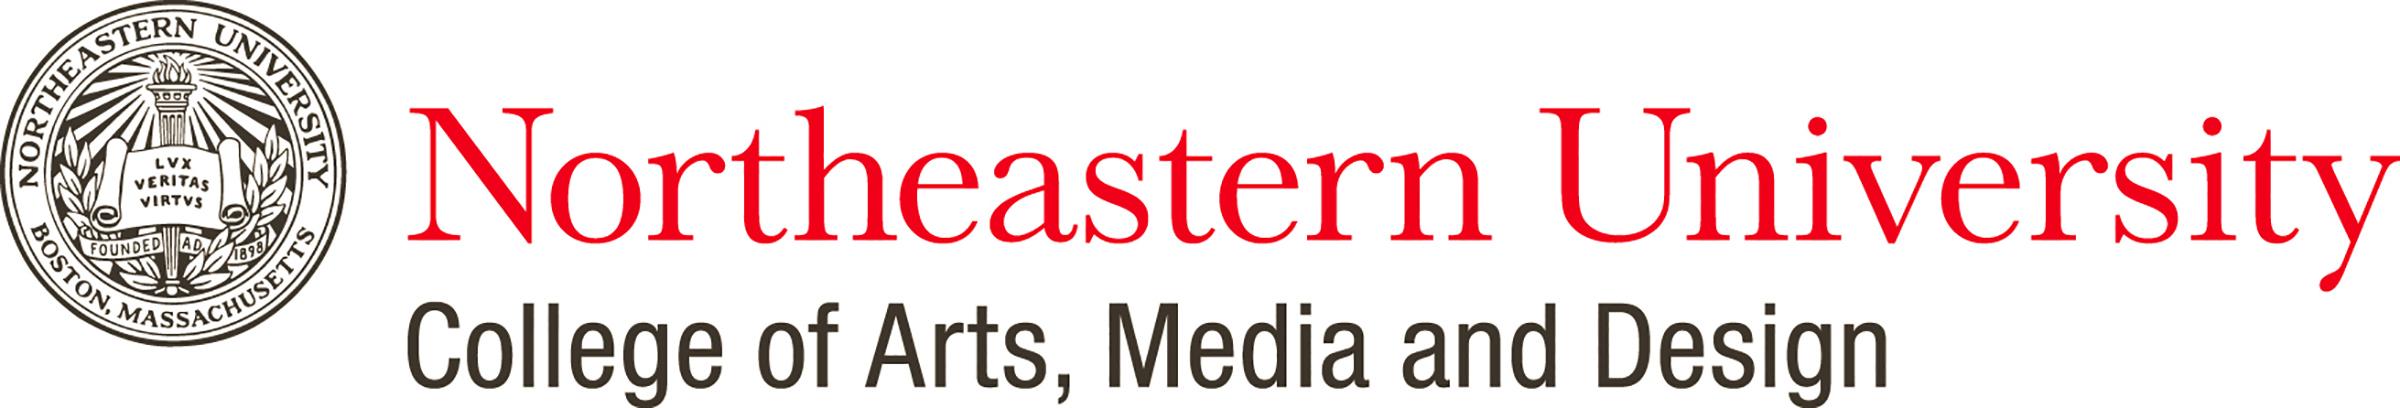 Northeastern University – College of Arts, Media and Design (CAMD)